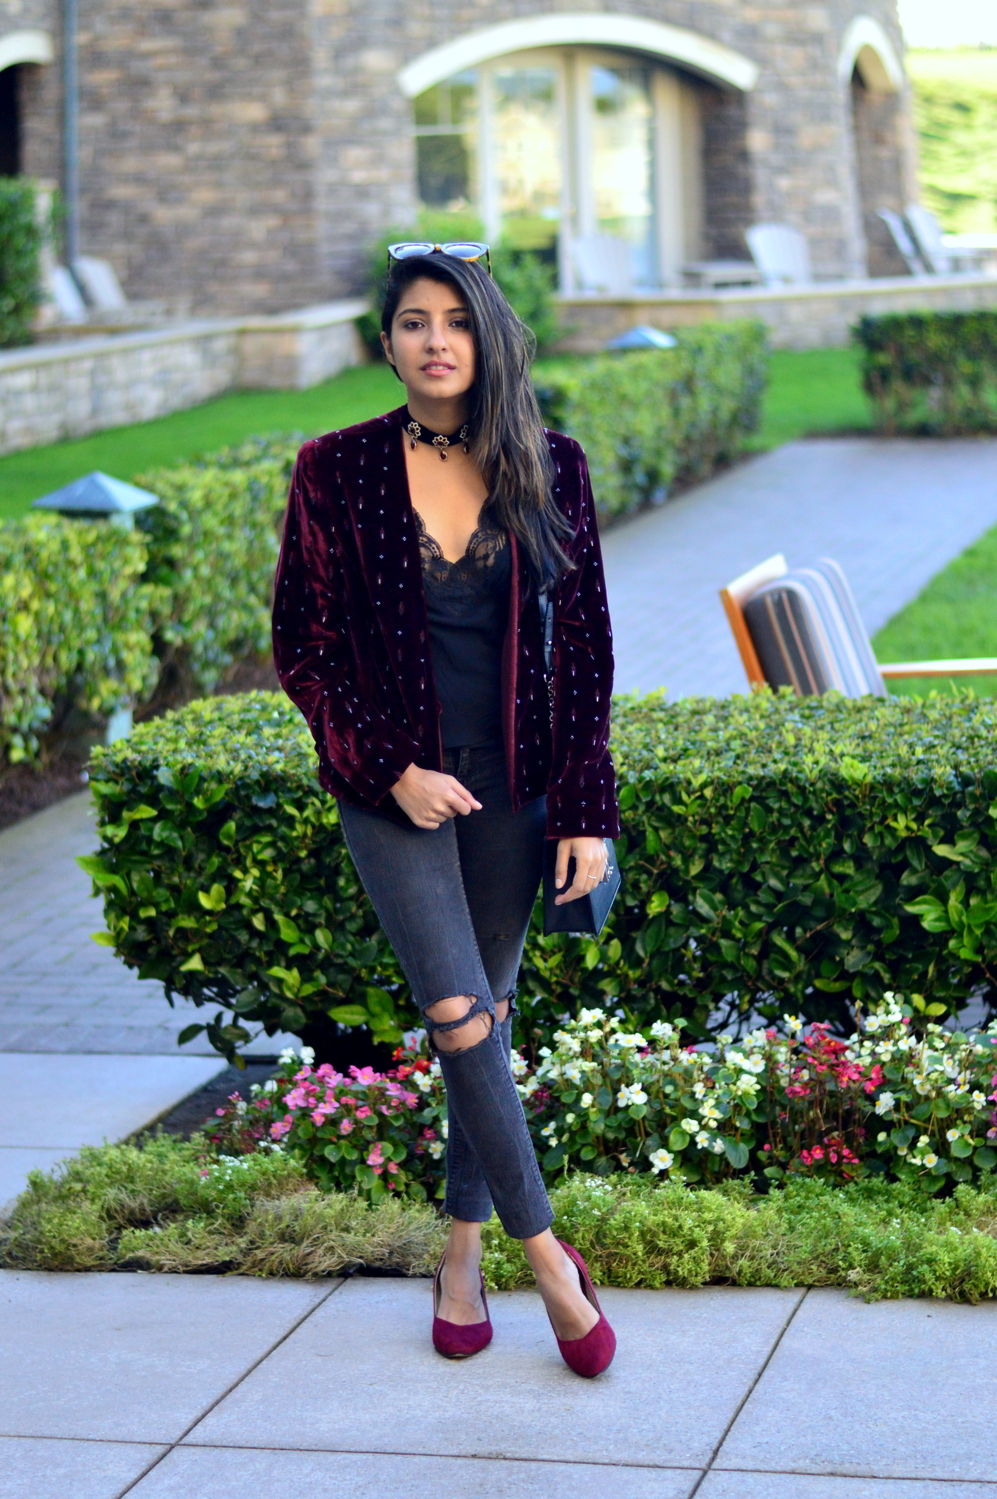 velvet-embellished-blazer-holiday-party-style-burgundy-black-blogger-outfit 4